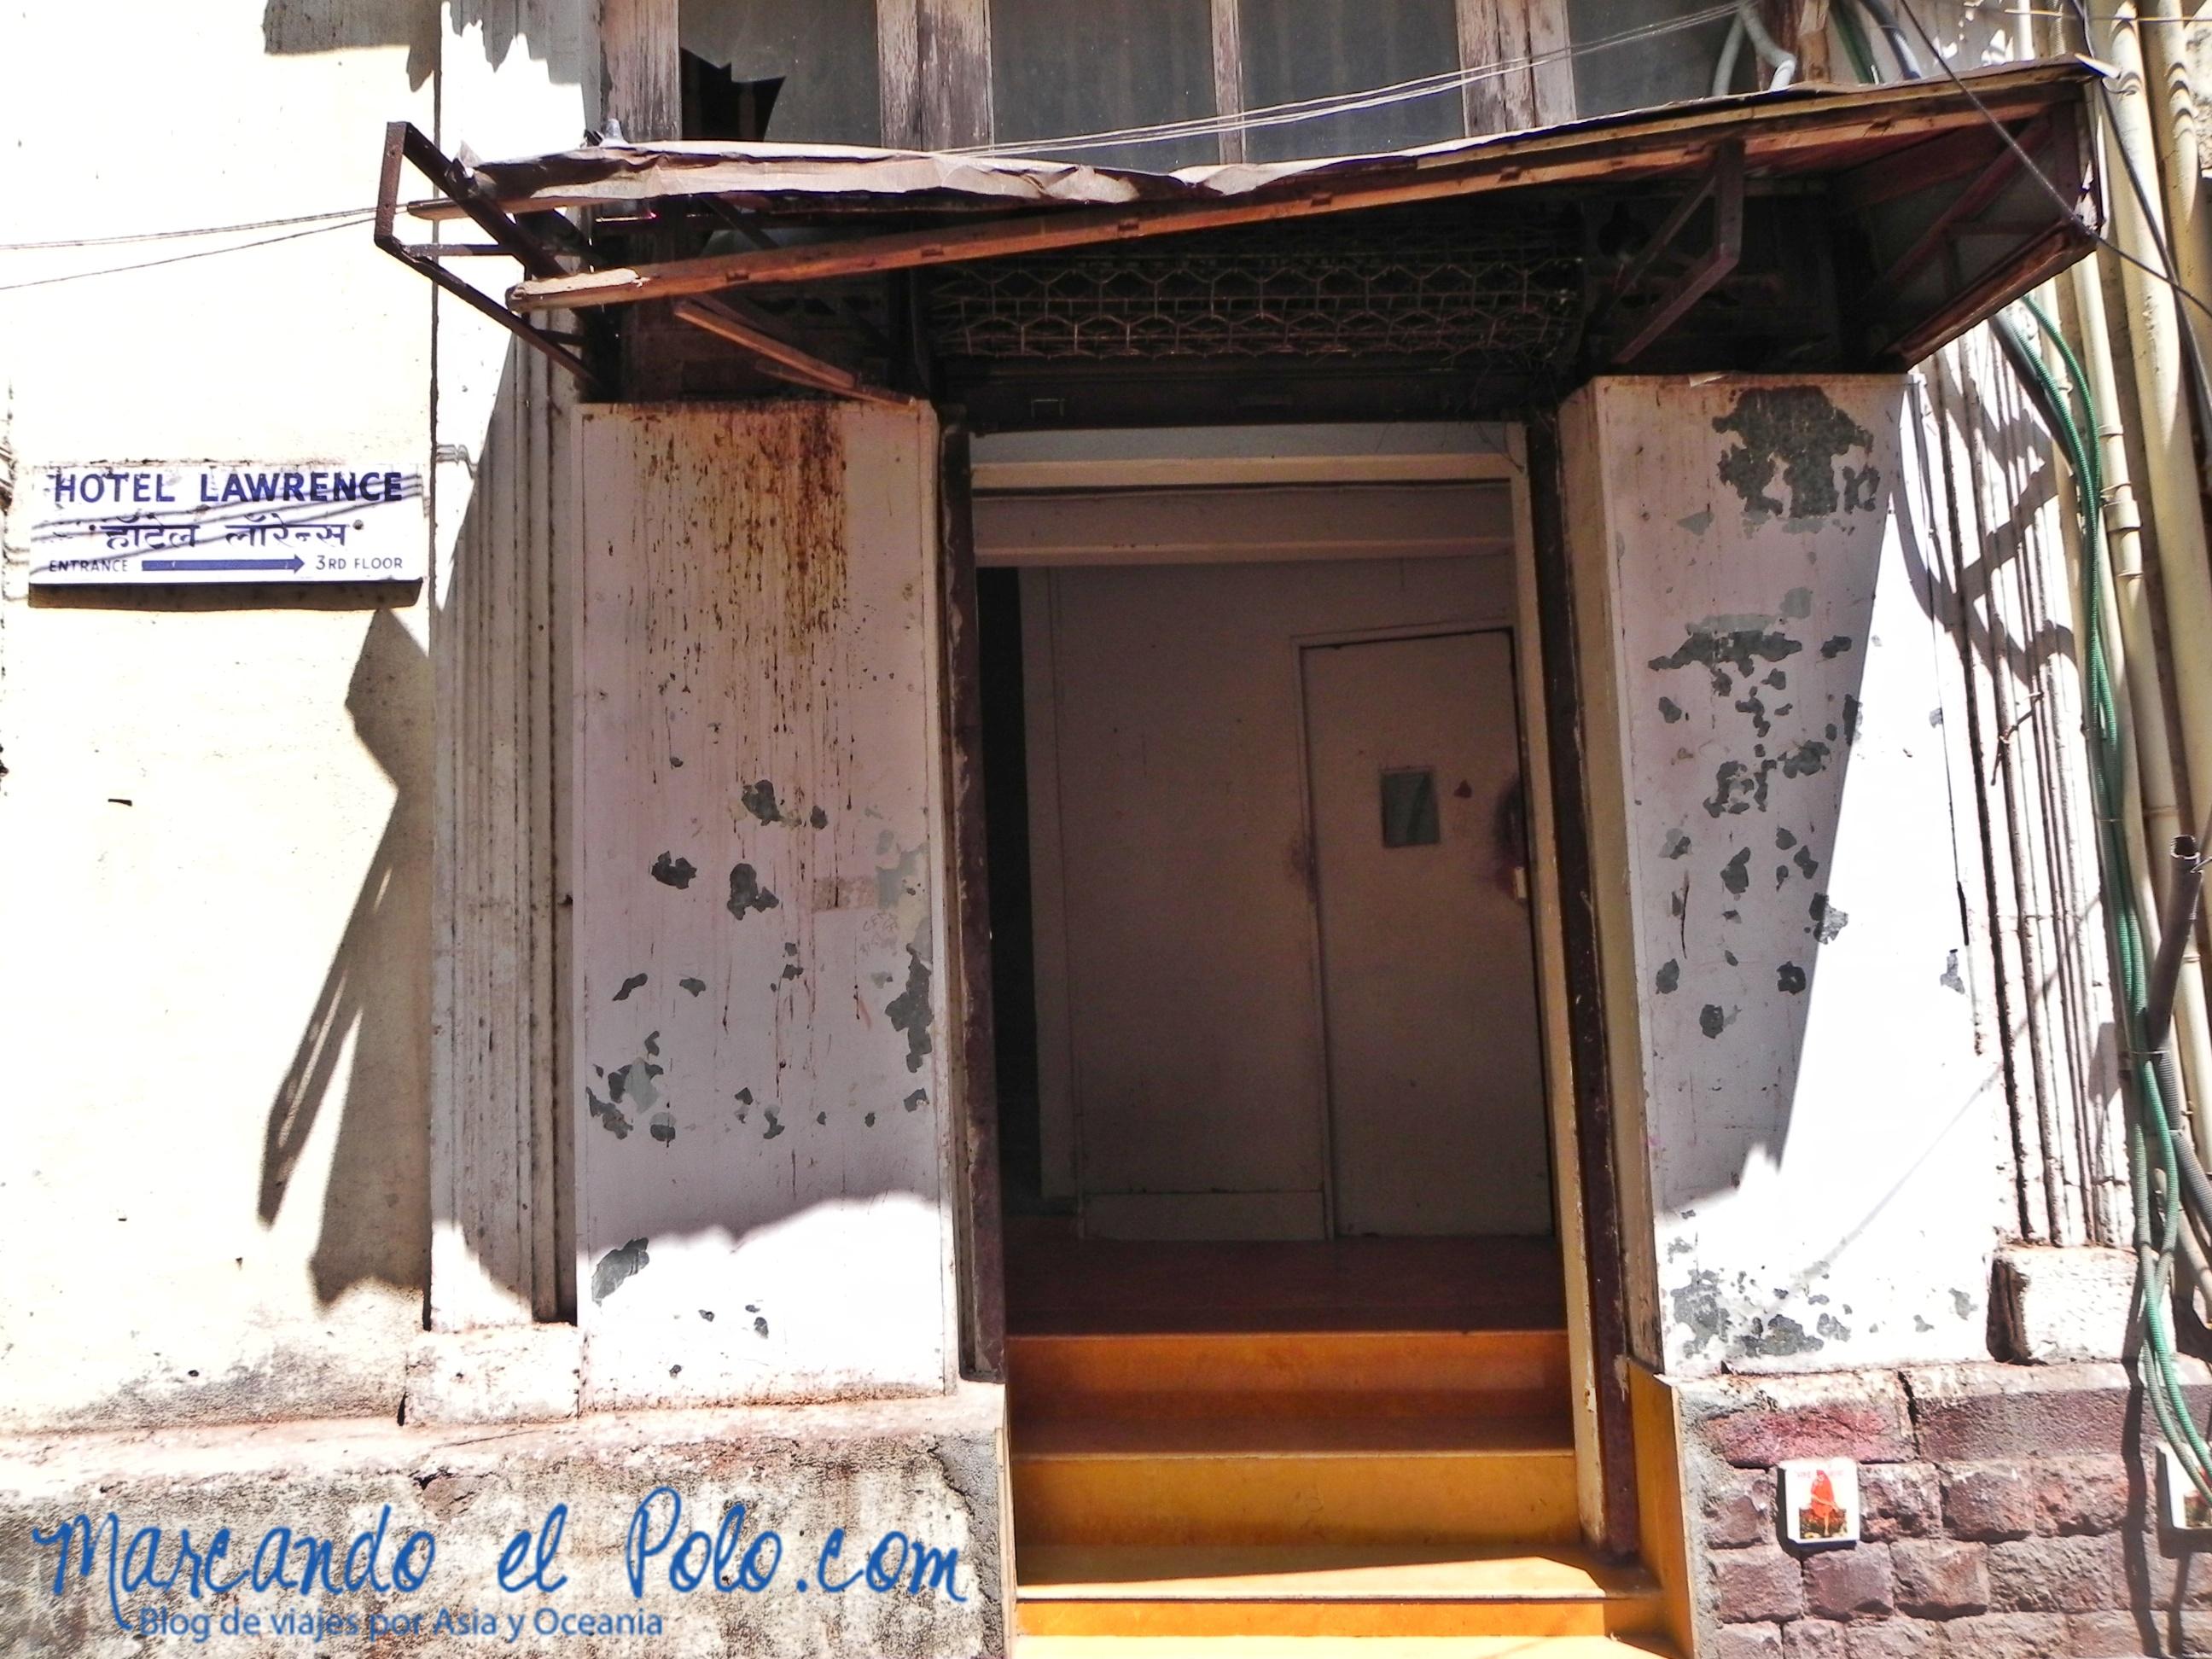 Presupuesto para viajar a India: Hotel Lawrence, Mumbai